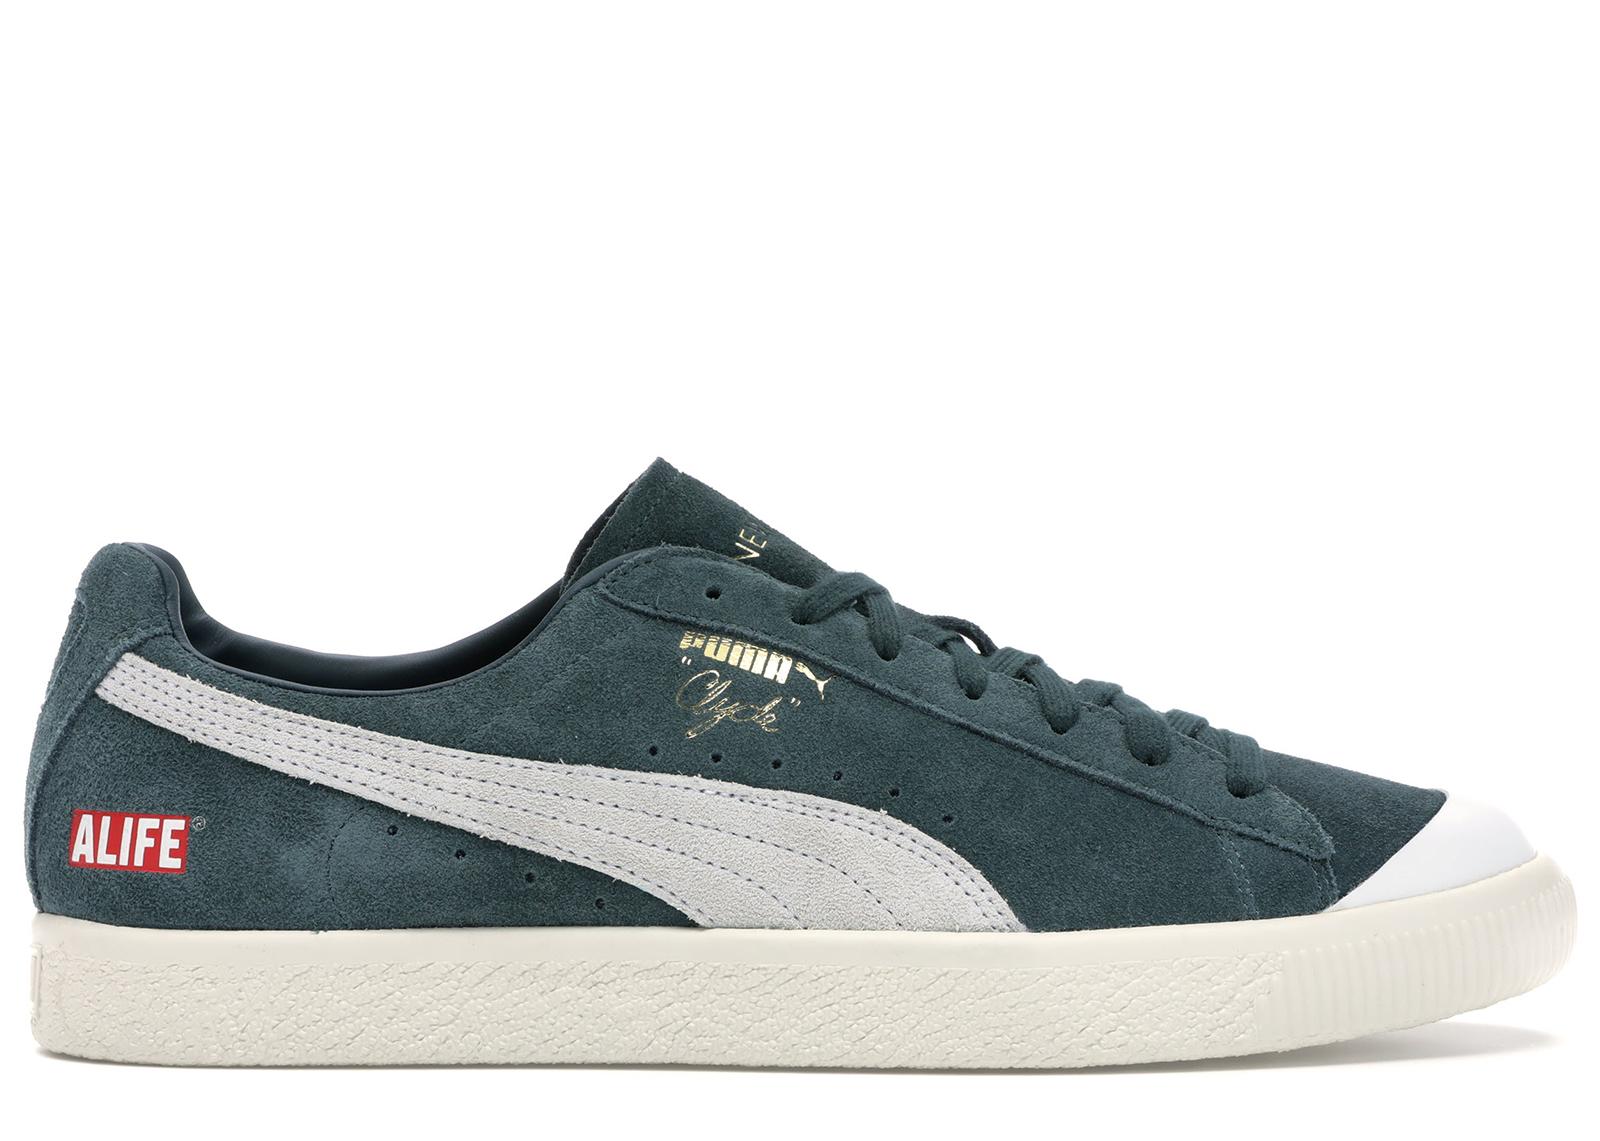 Puma Clyde Alife New York Green - 365924-01